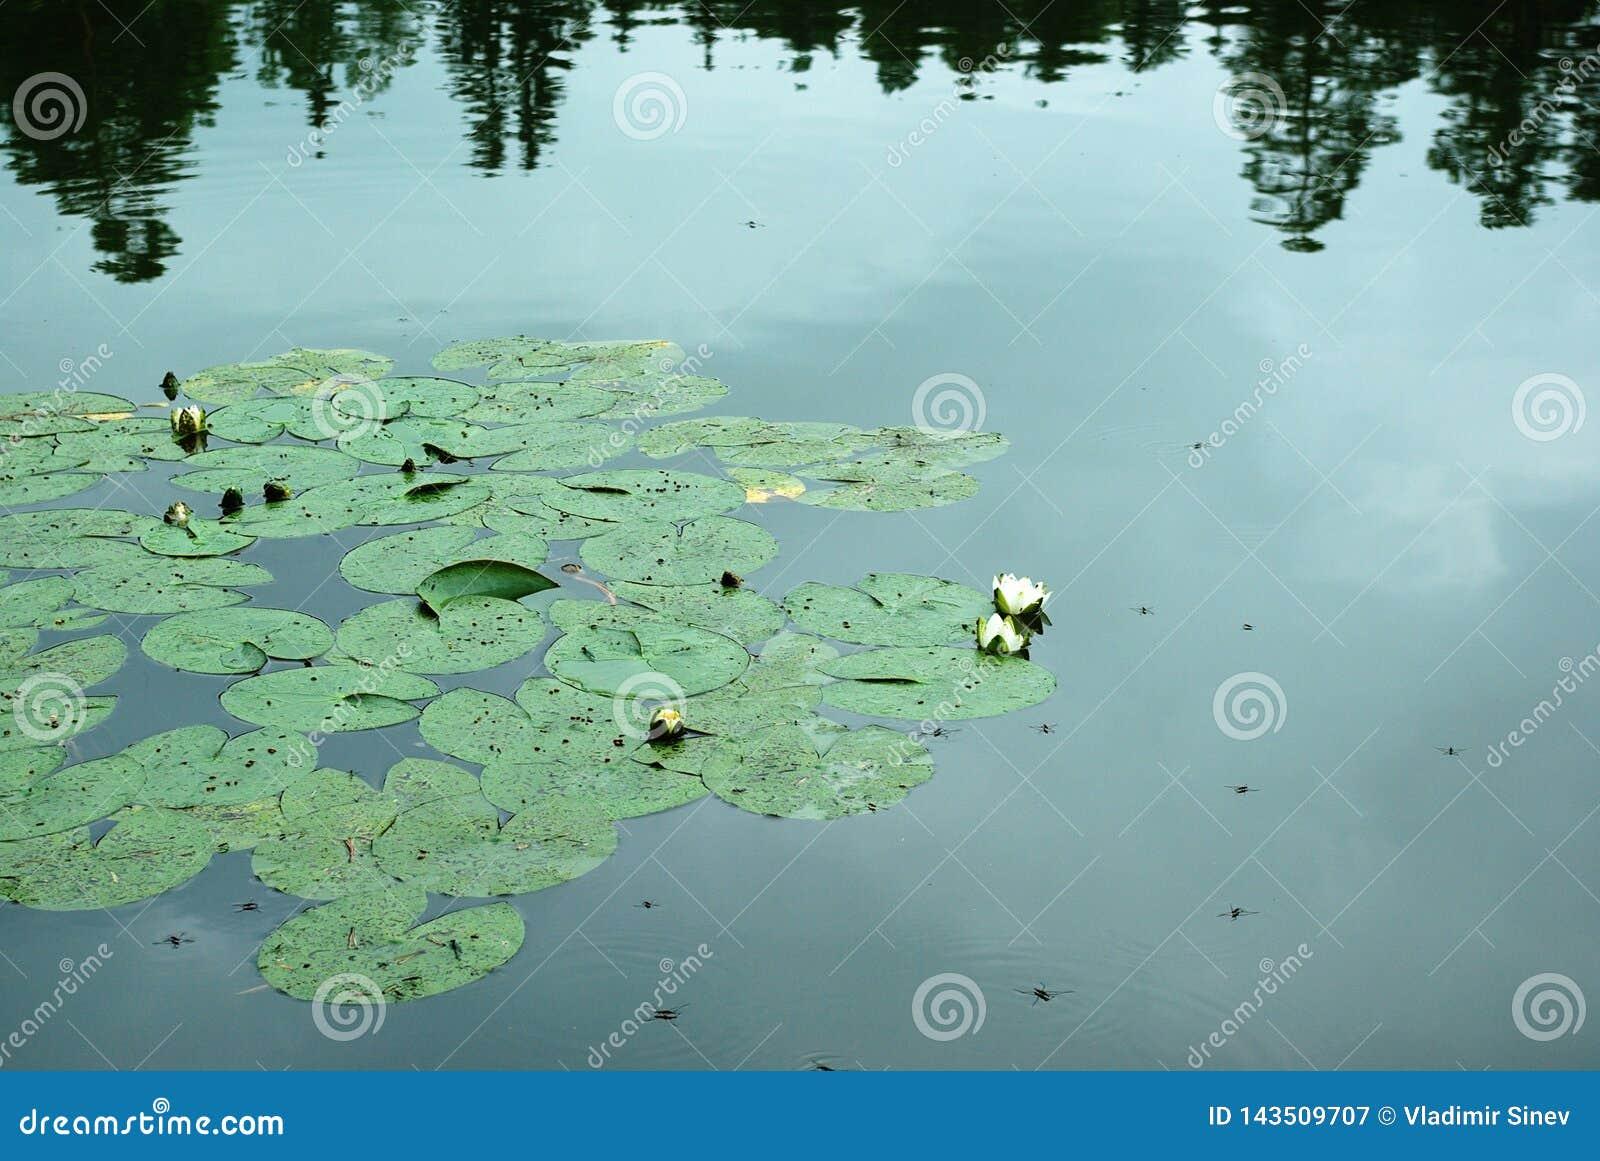 Jezioro Wodne leluje